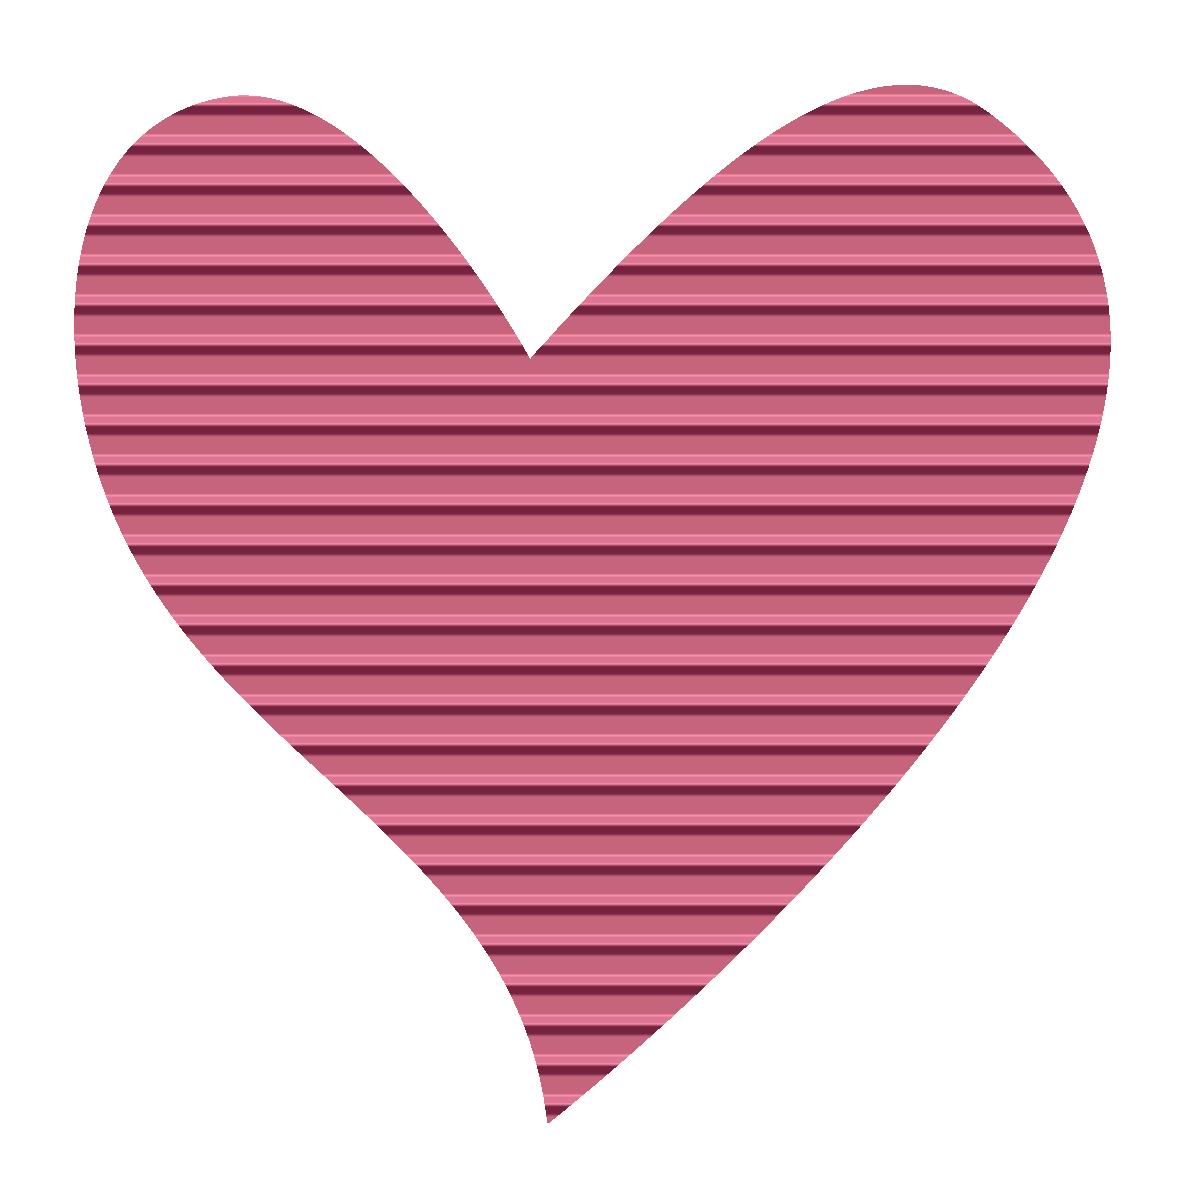 Heart-shaped clipart #12